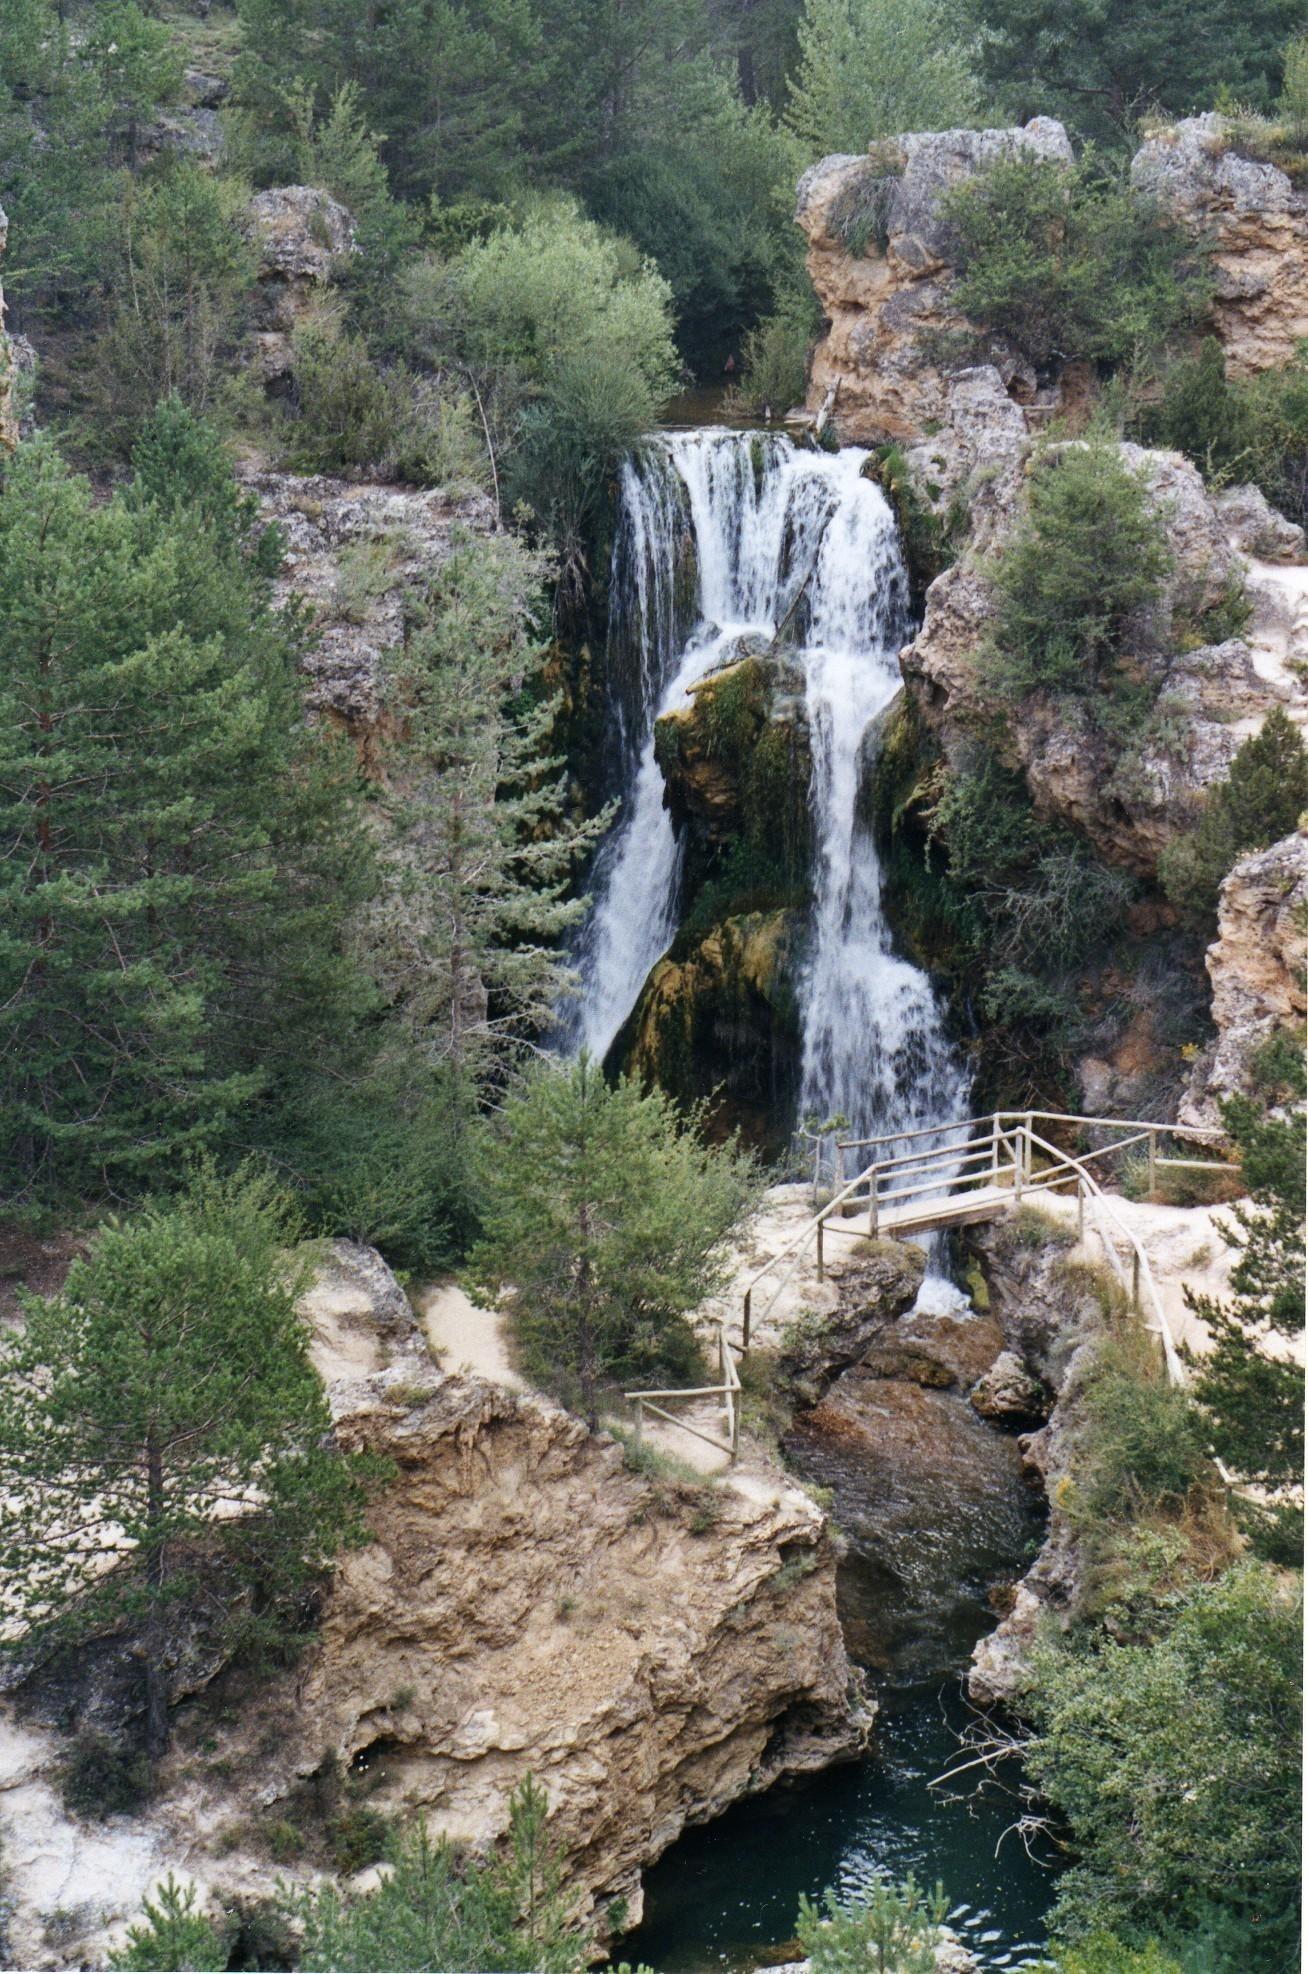 Calomarde, Aragon, Spain